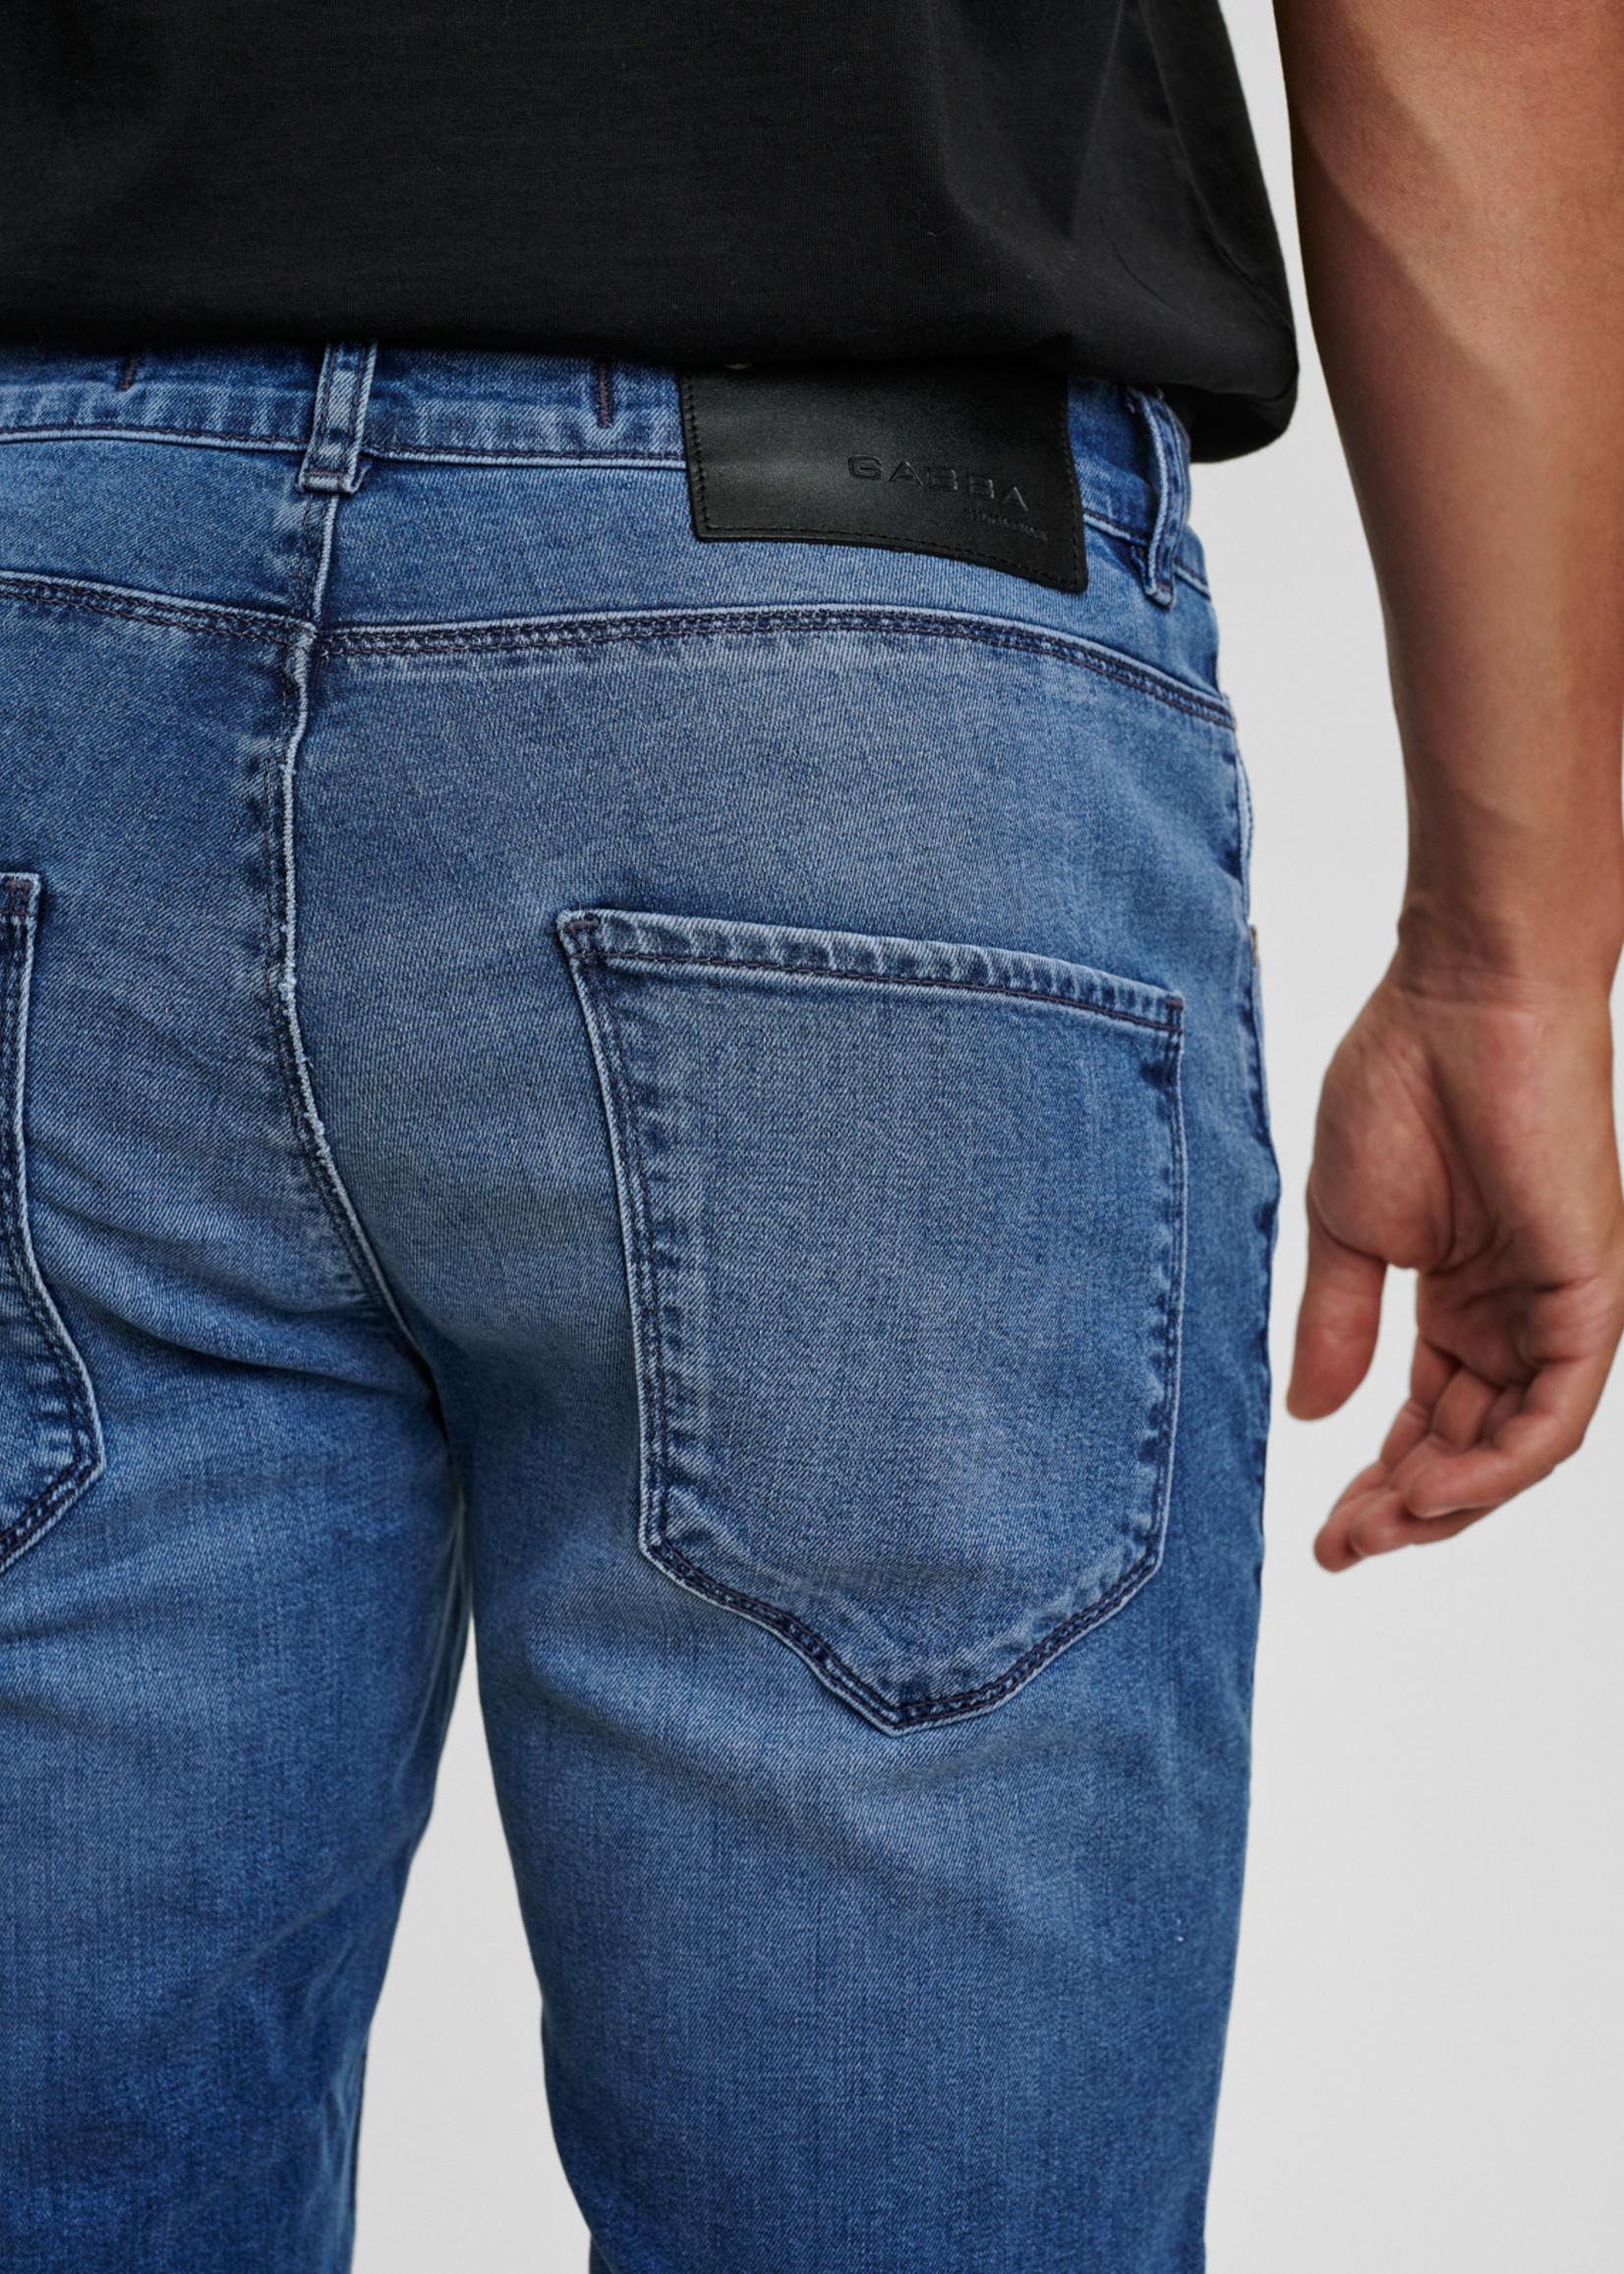 Gabba Rey K3866 Jeans